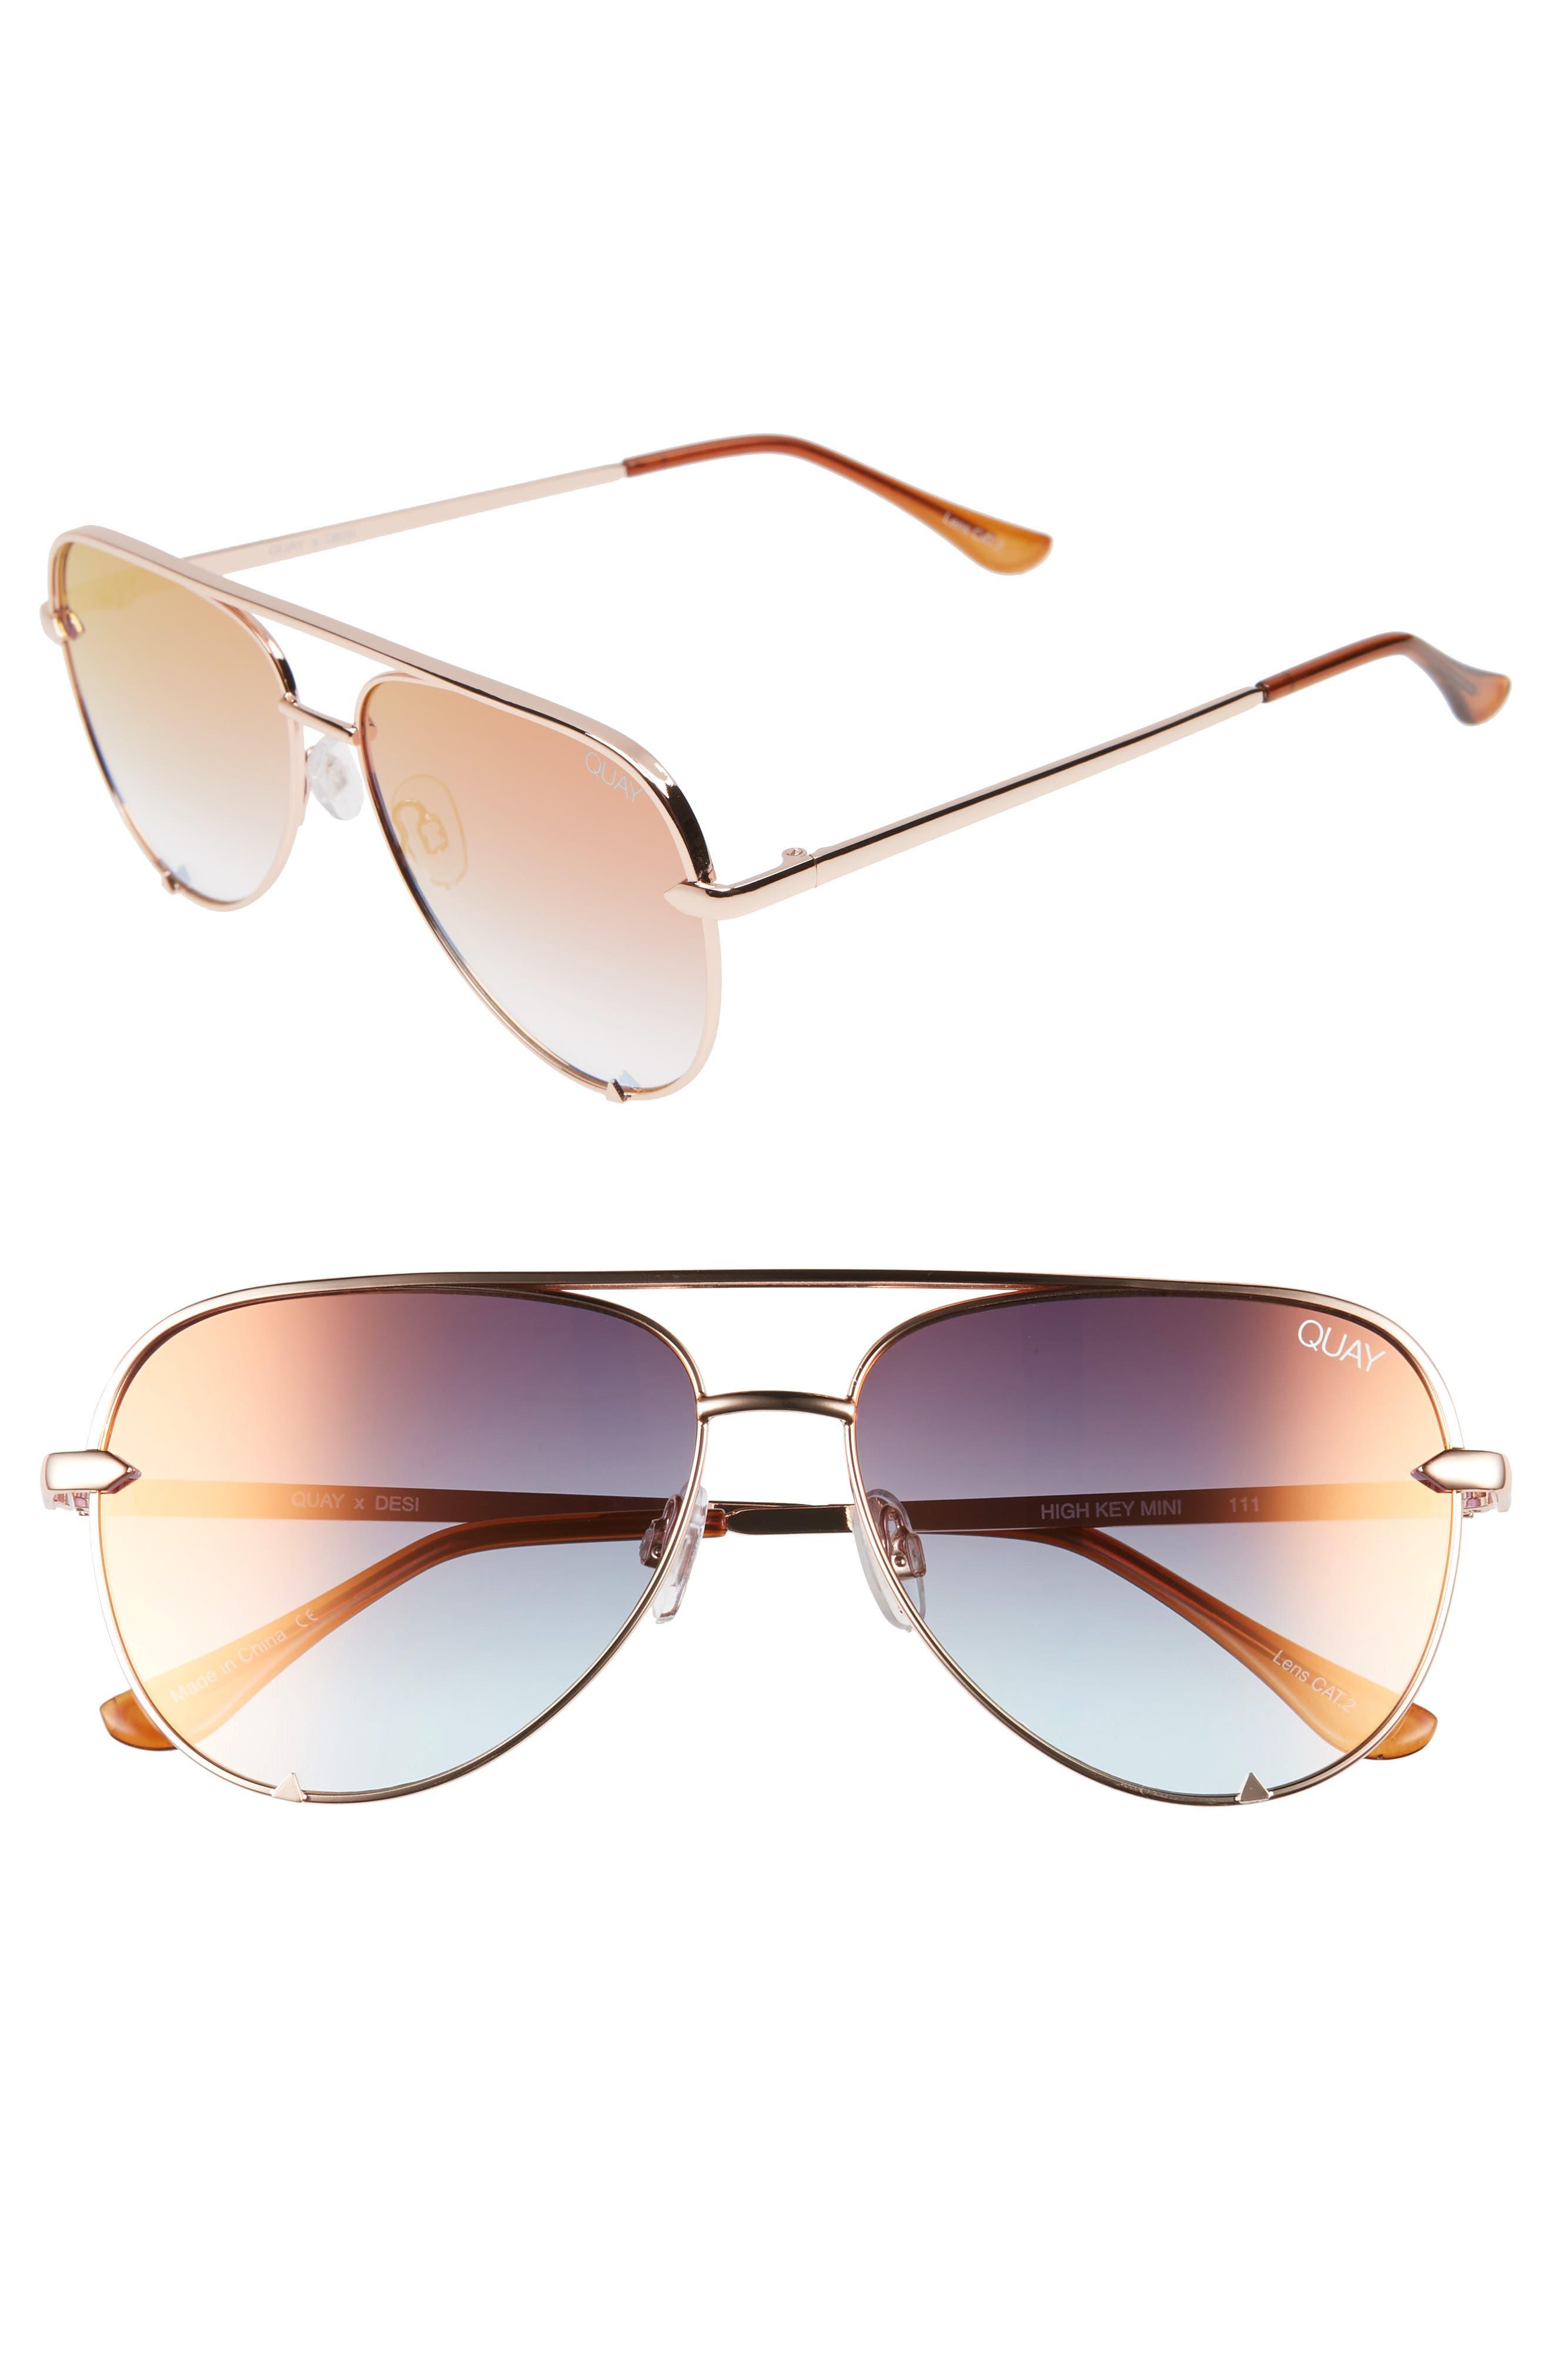 QUAY AUSTRALIA, x Desi Perkins High Key Mini 57mm Aviator Sunglasses, Main thumbnail 1, color, ROSE/ CPRFD